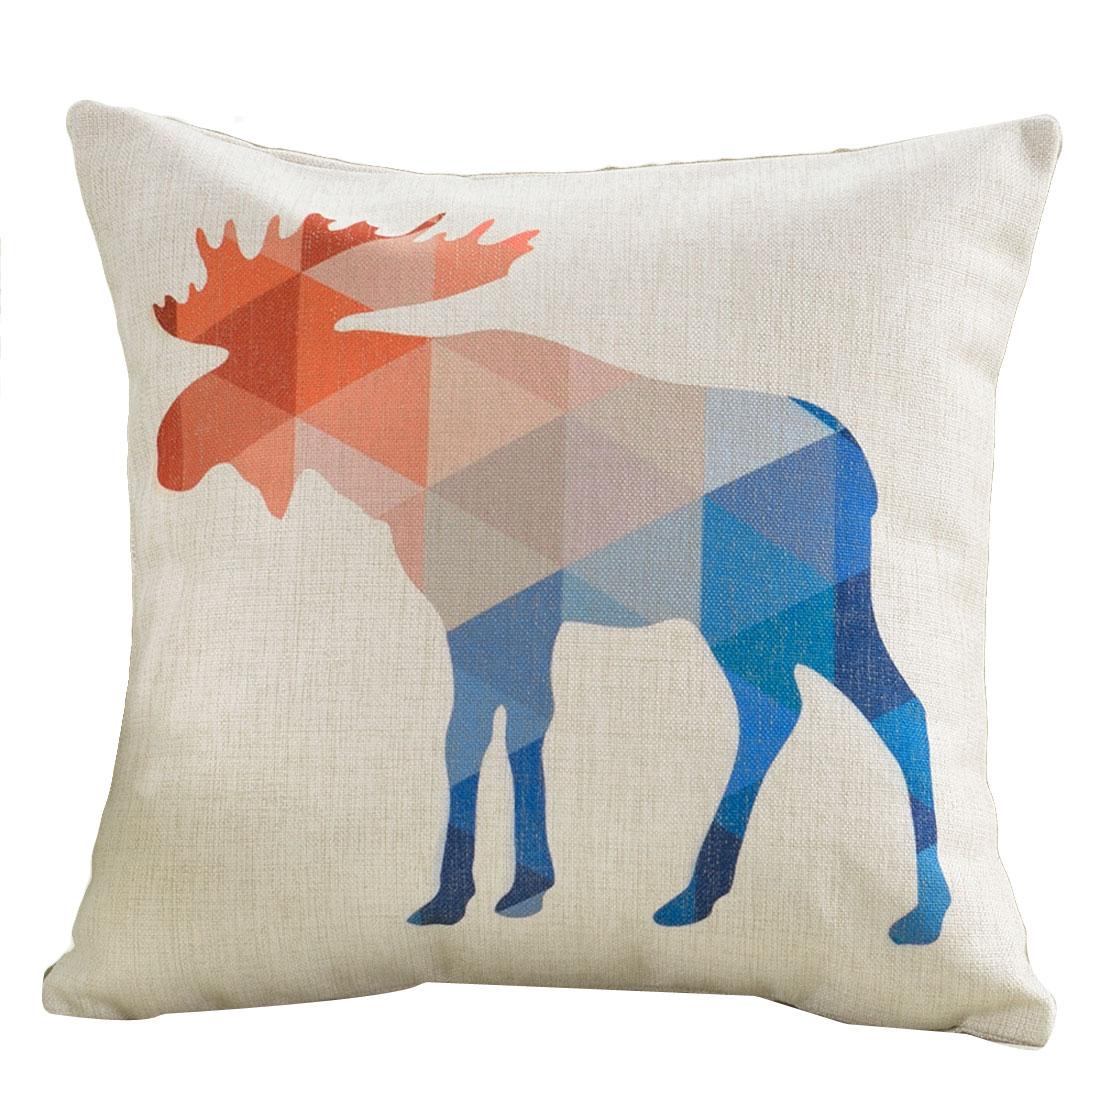 Sofa Cotton Linen Deer Pattern Square Design Waist Throw Cushion Pillow Cover